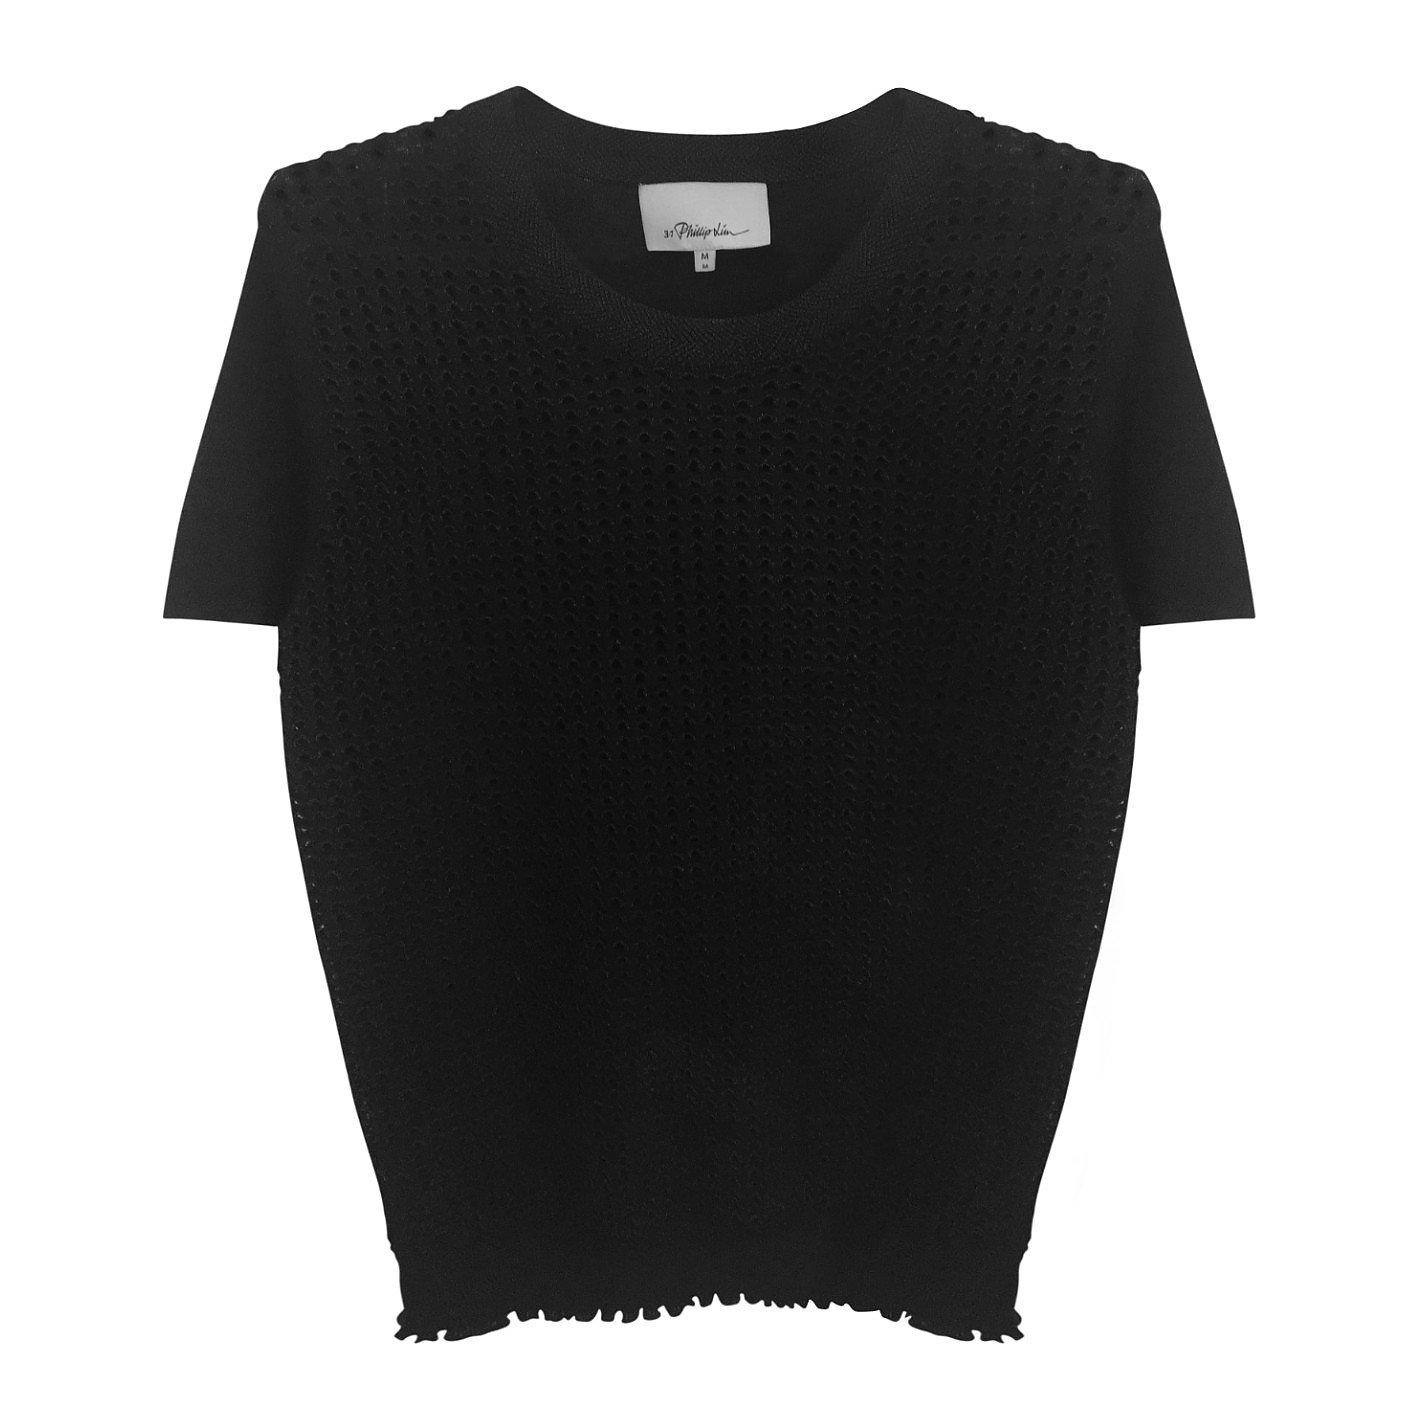 3.1 Phillip Lim Crocheted Jersey